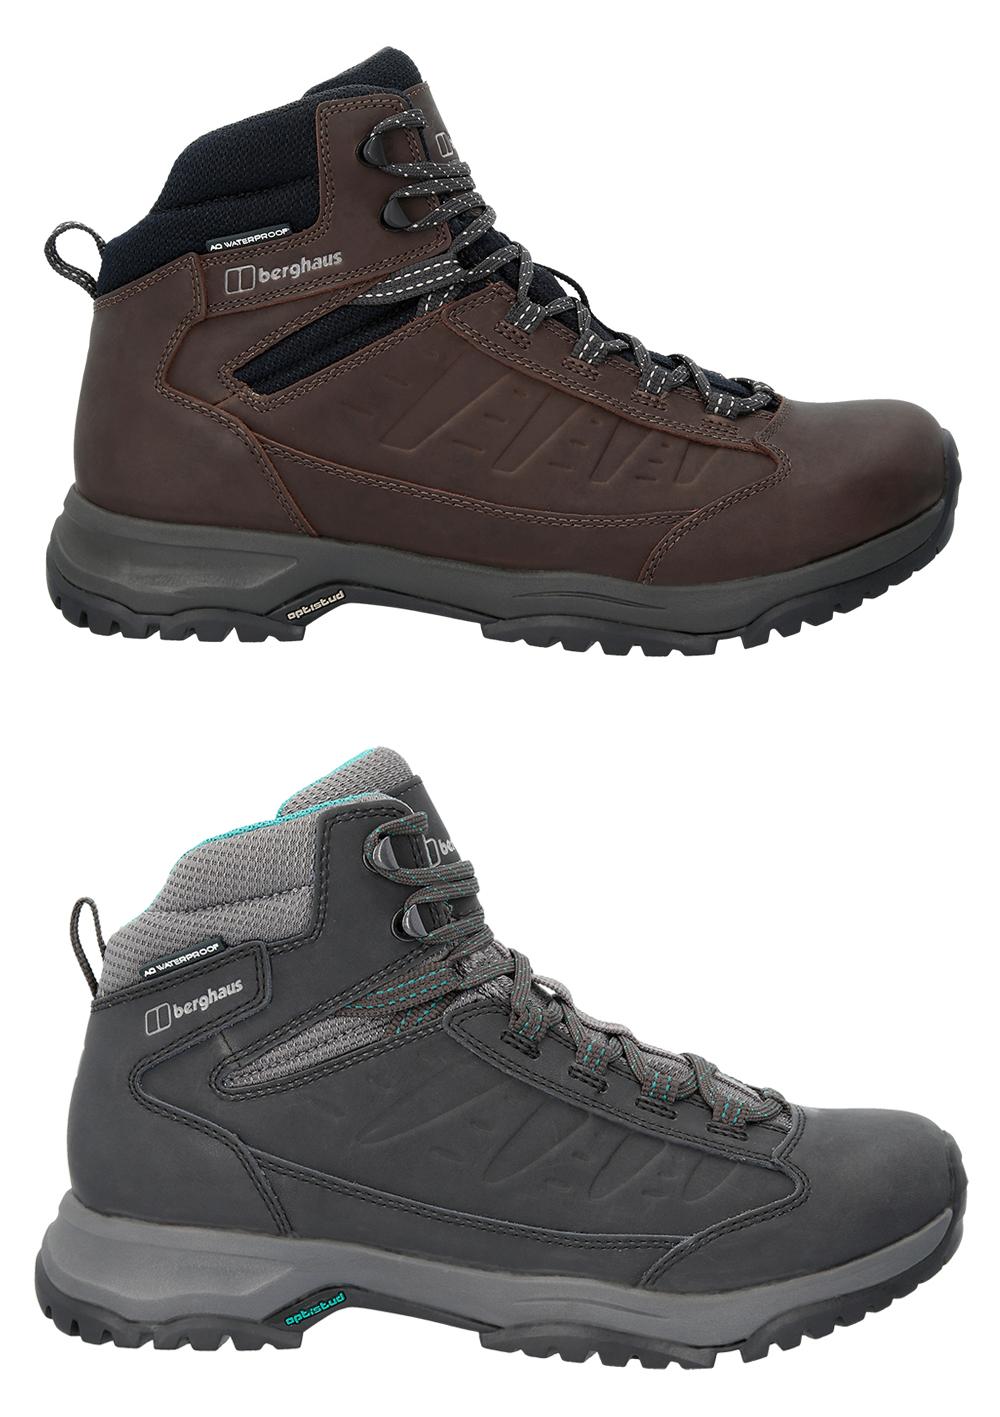 Berghaus Expeditor Ridge 2.0 Boots